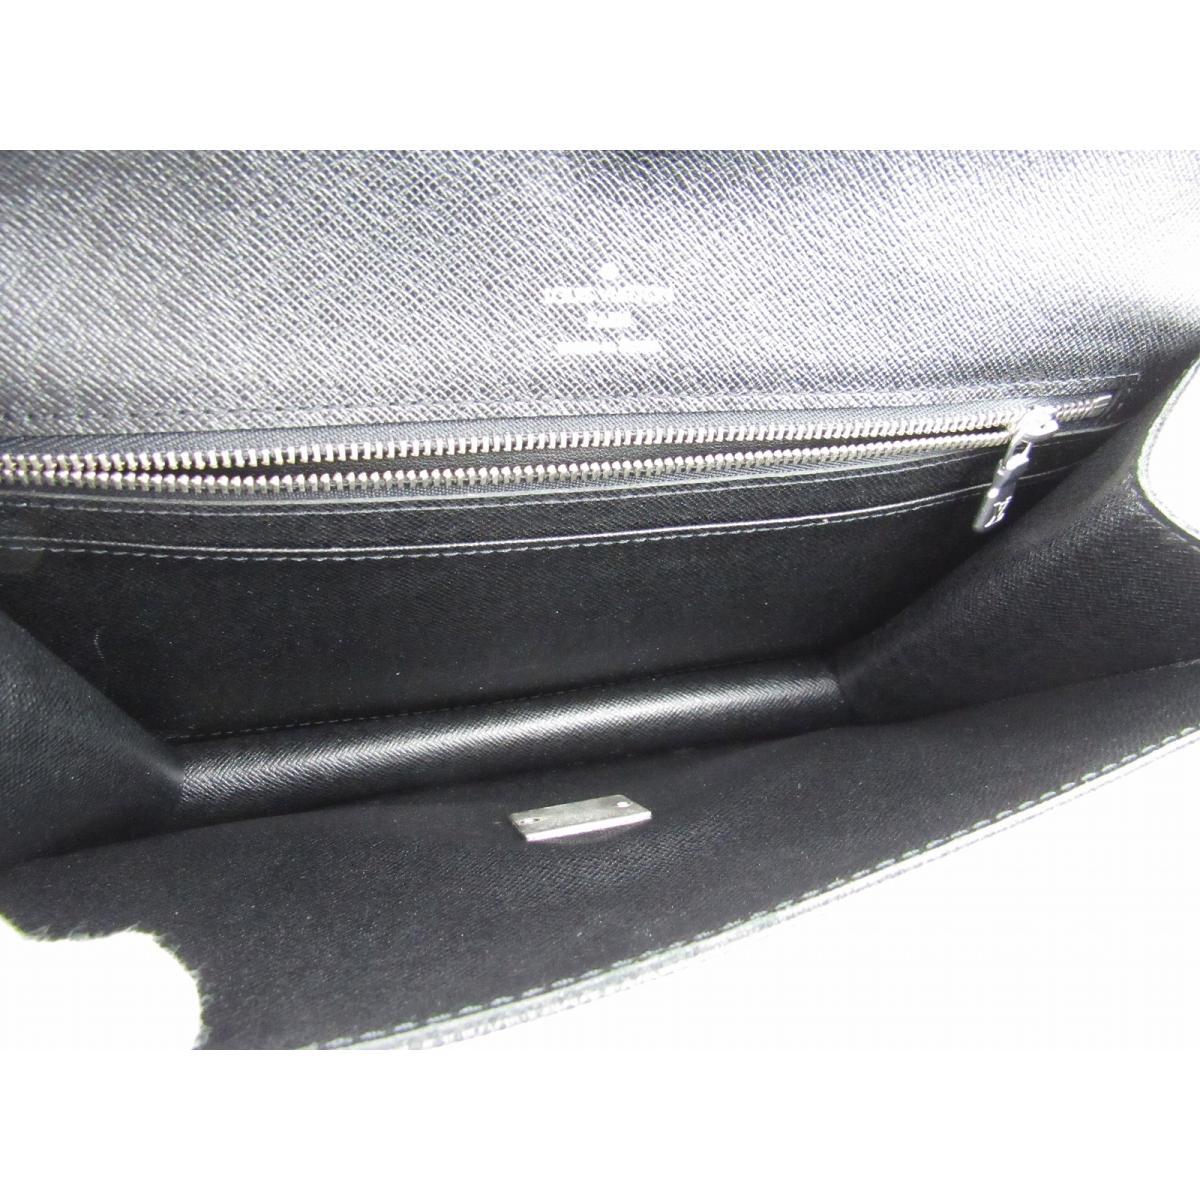 LOUIS VUITTON バッグ M30782 セレンガ セカンドバッグ/メンズ